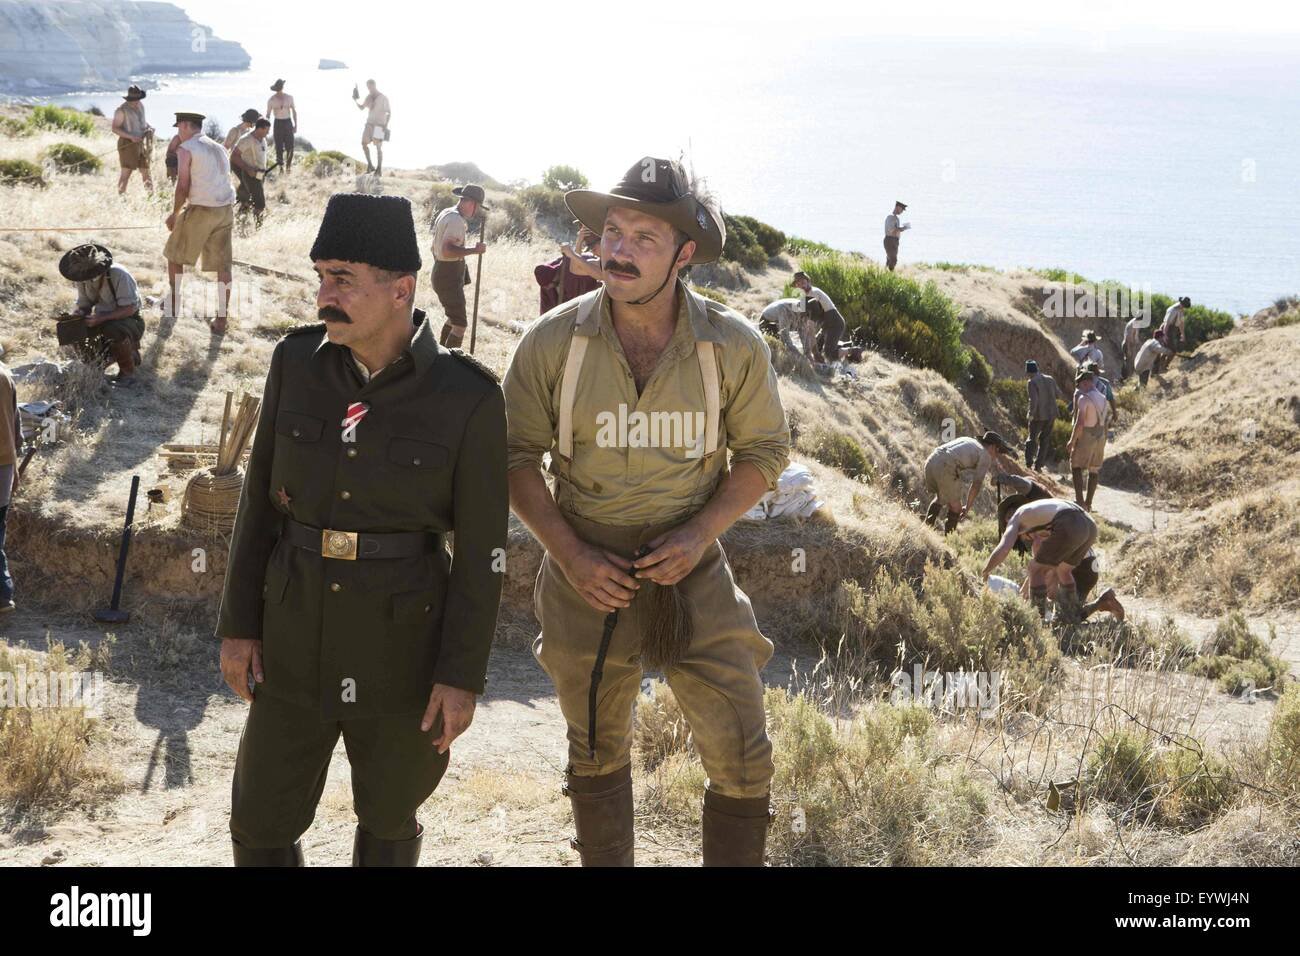 The Water Diviner ; Year : 2014 USA / Turkey / Australia ; Director : Russell Crowe ; Yilmaz Erdogan, Jai Courtney - Stock Image